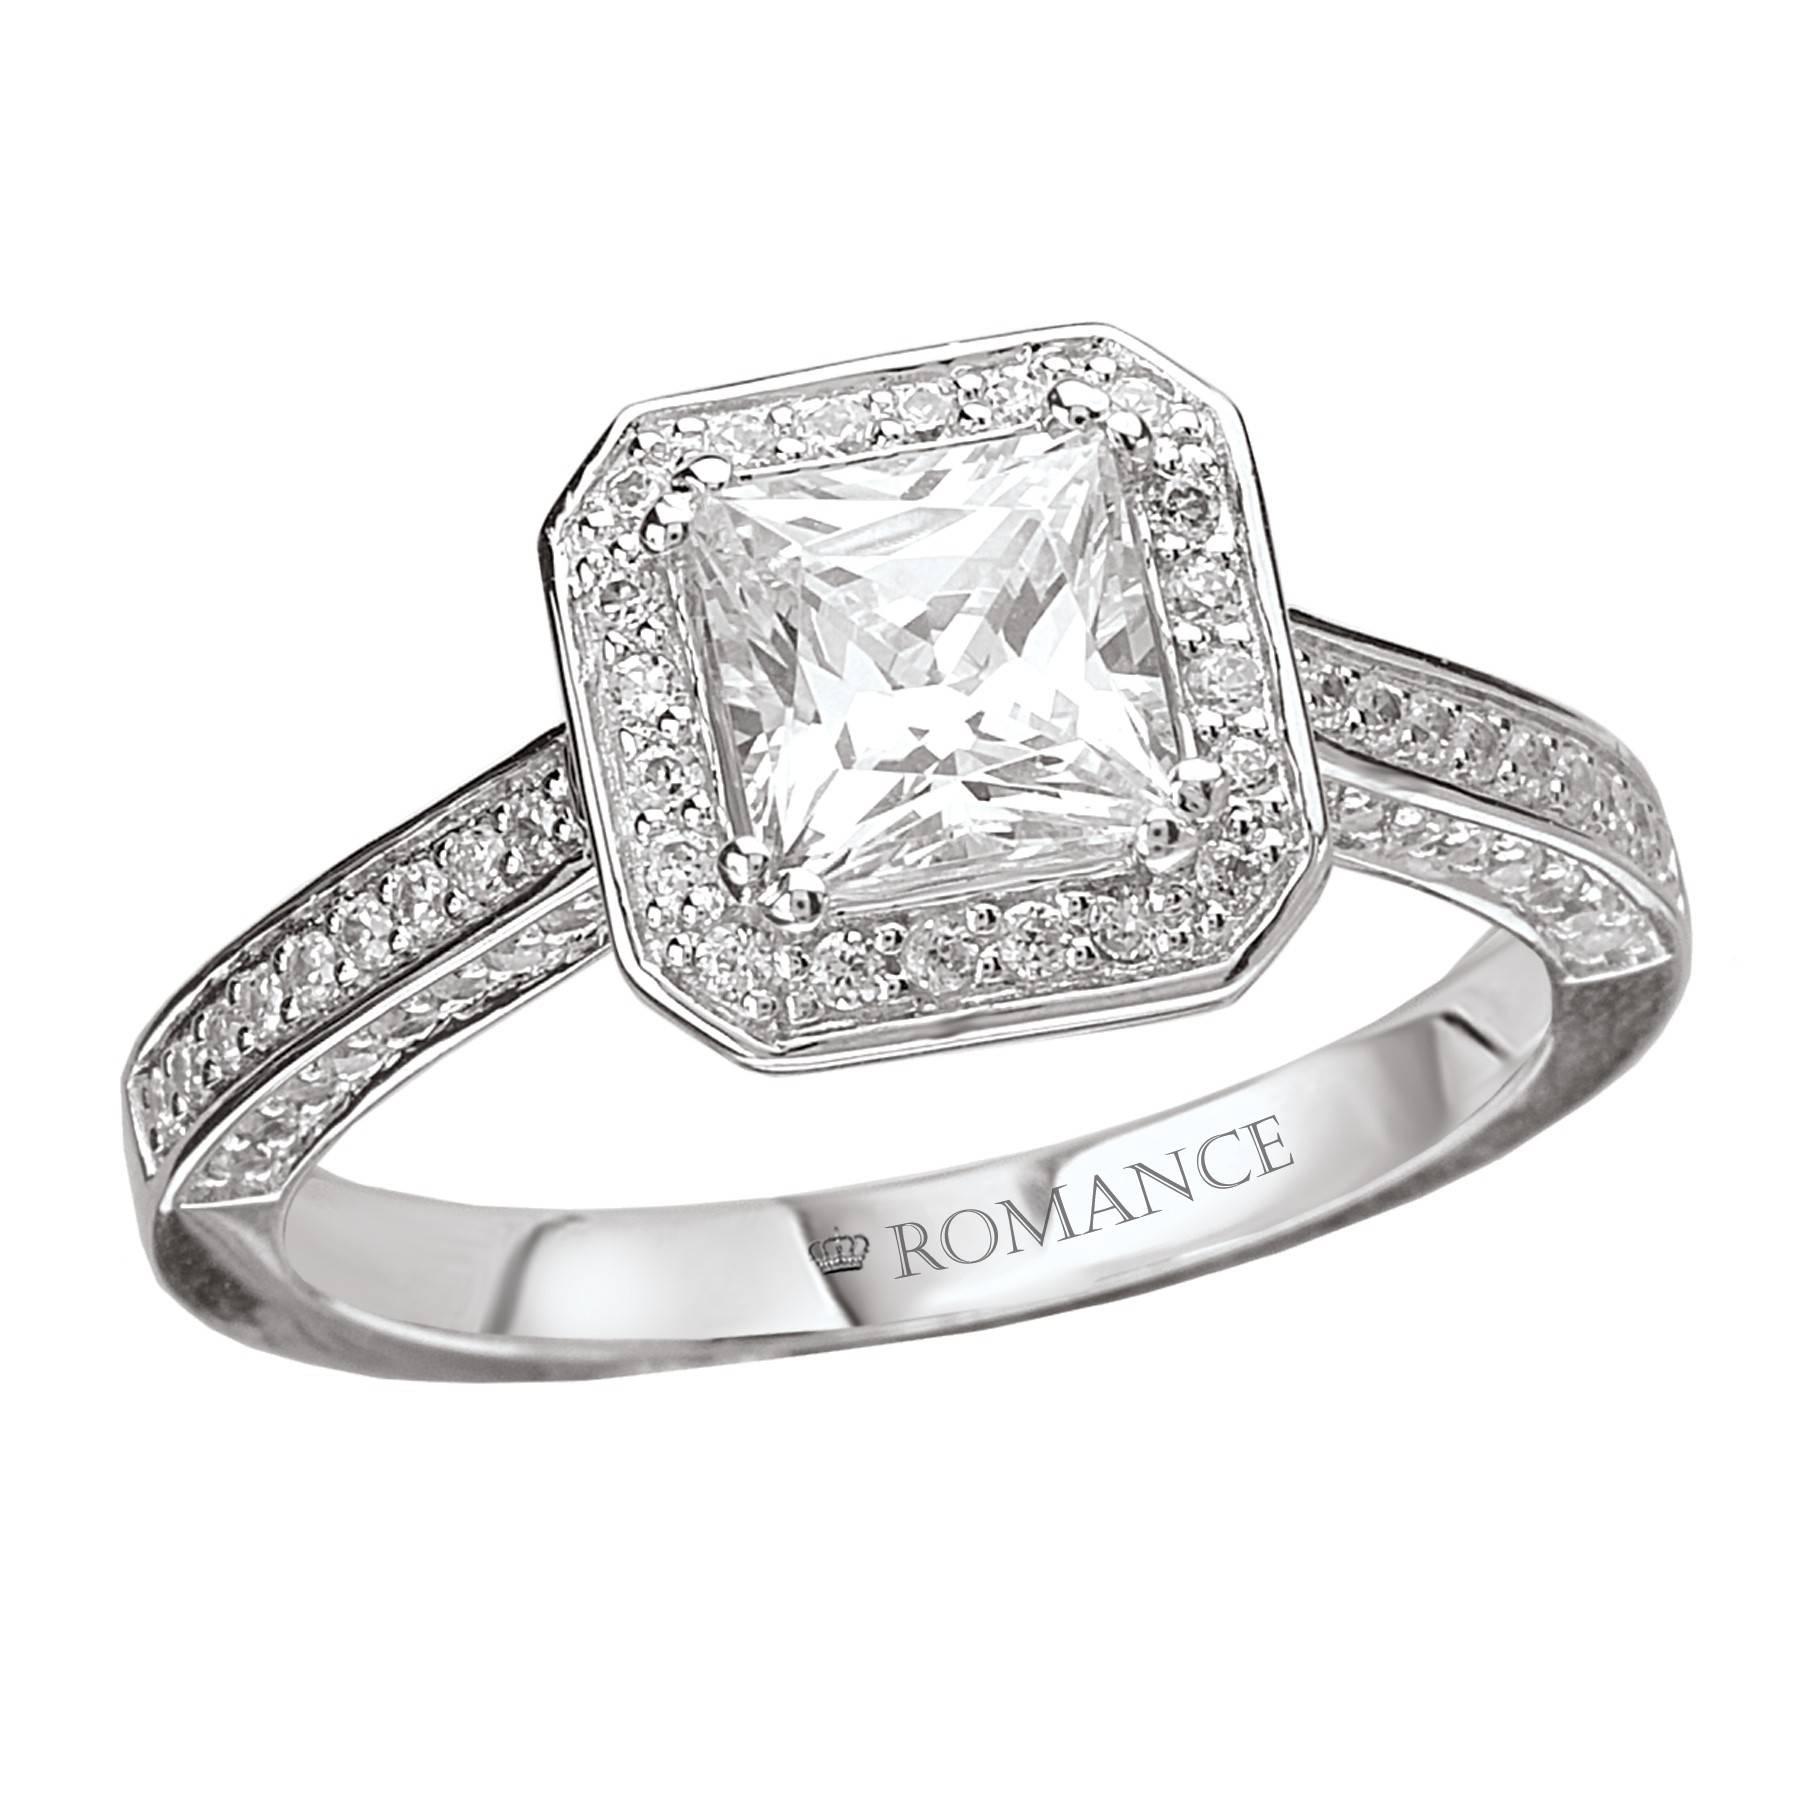 Rings : Princess Cut Rose Gold Engagement Rings Pear Engagement Regarding Most Current Princess Cut Anniversary Rings (View 22 of 25)